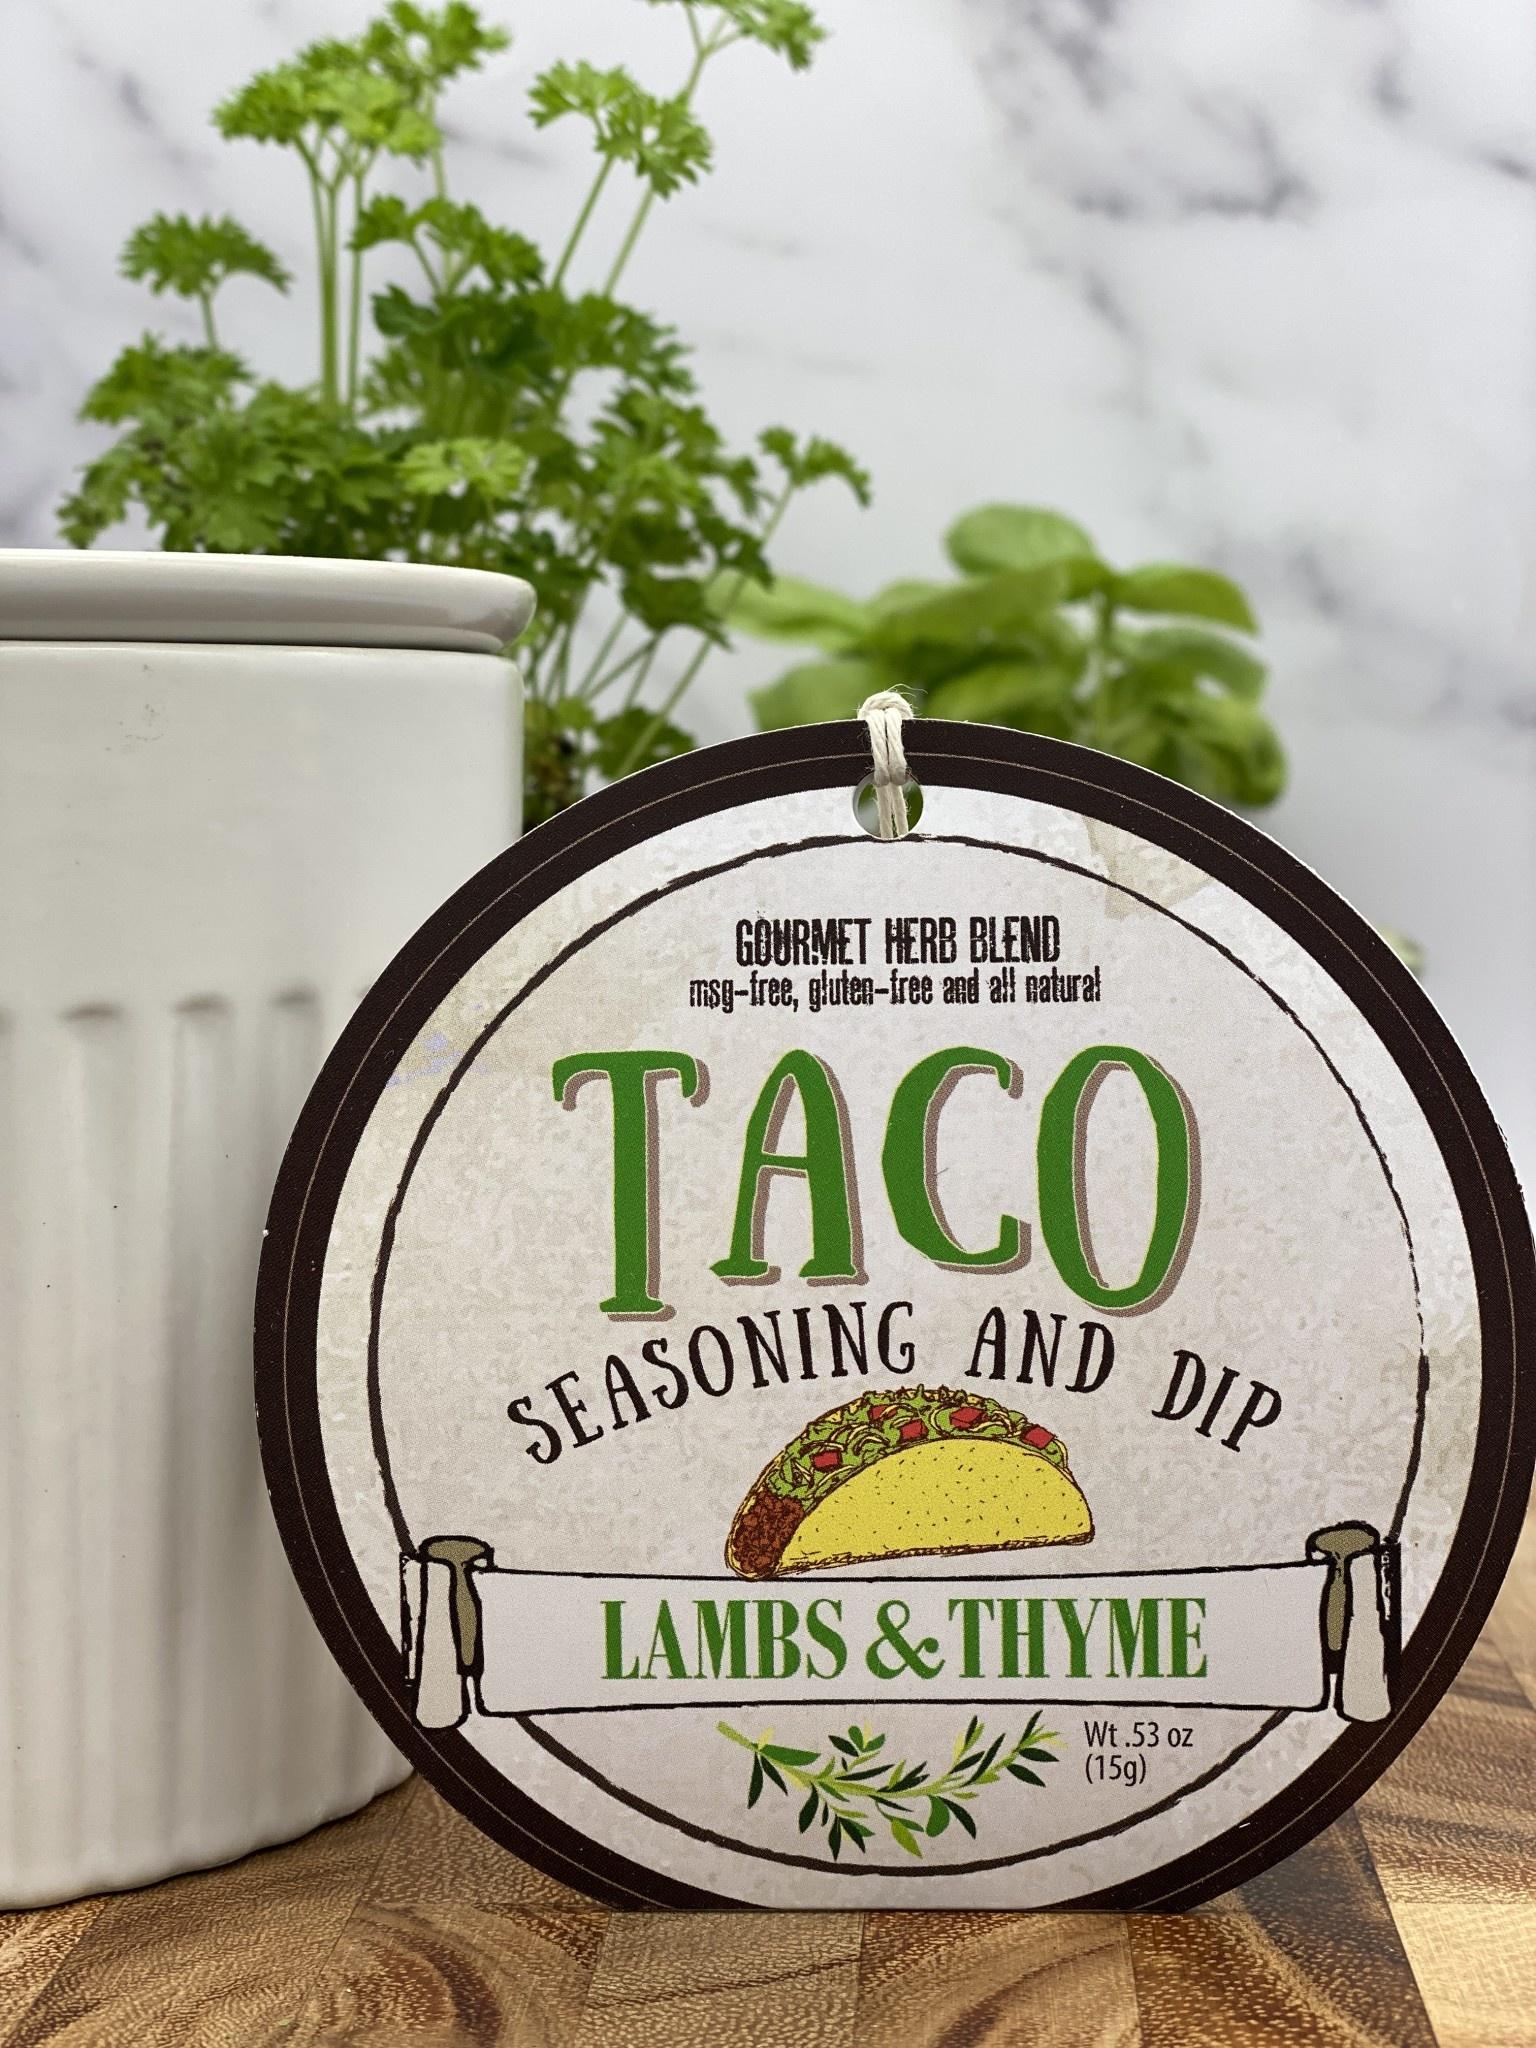 Lambs & Thyme Taco Dip